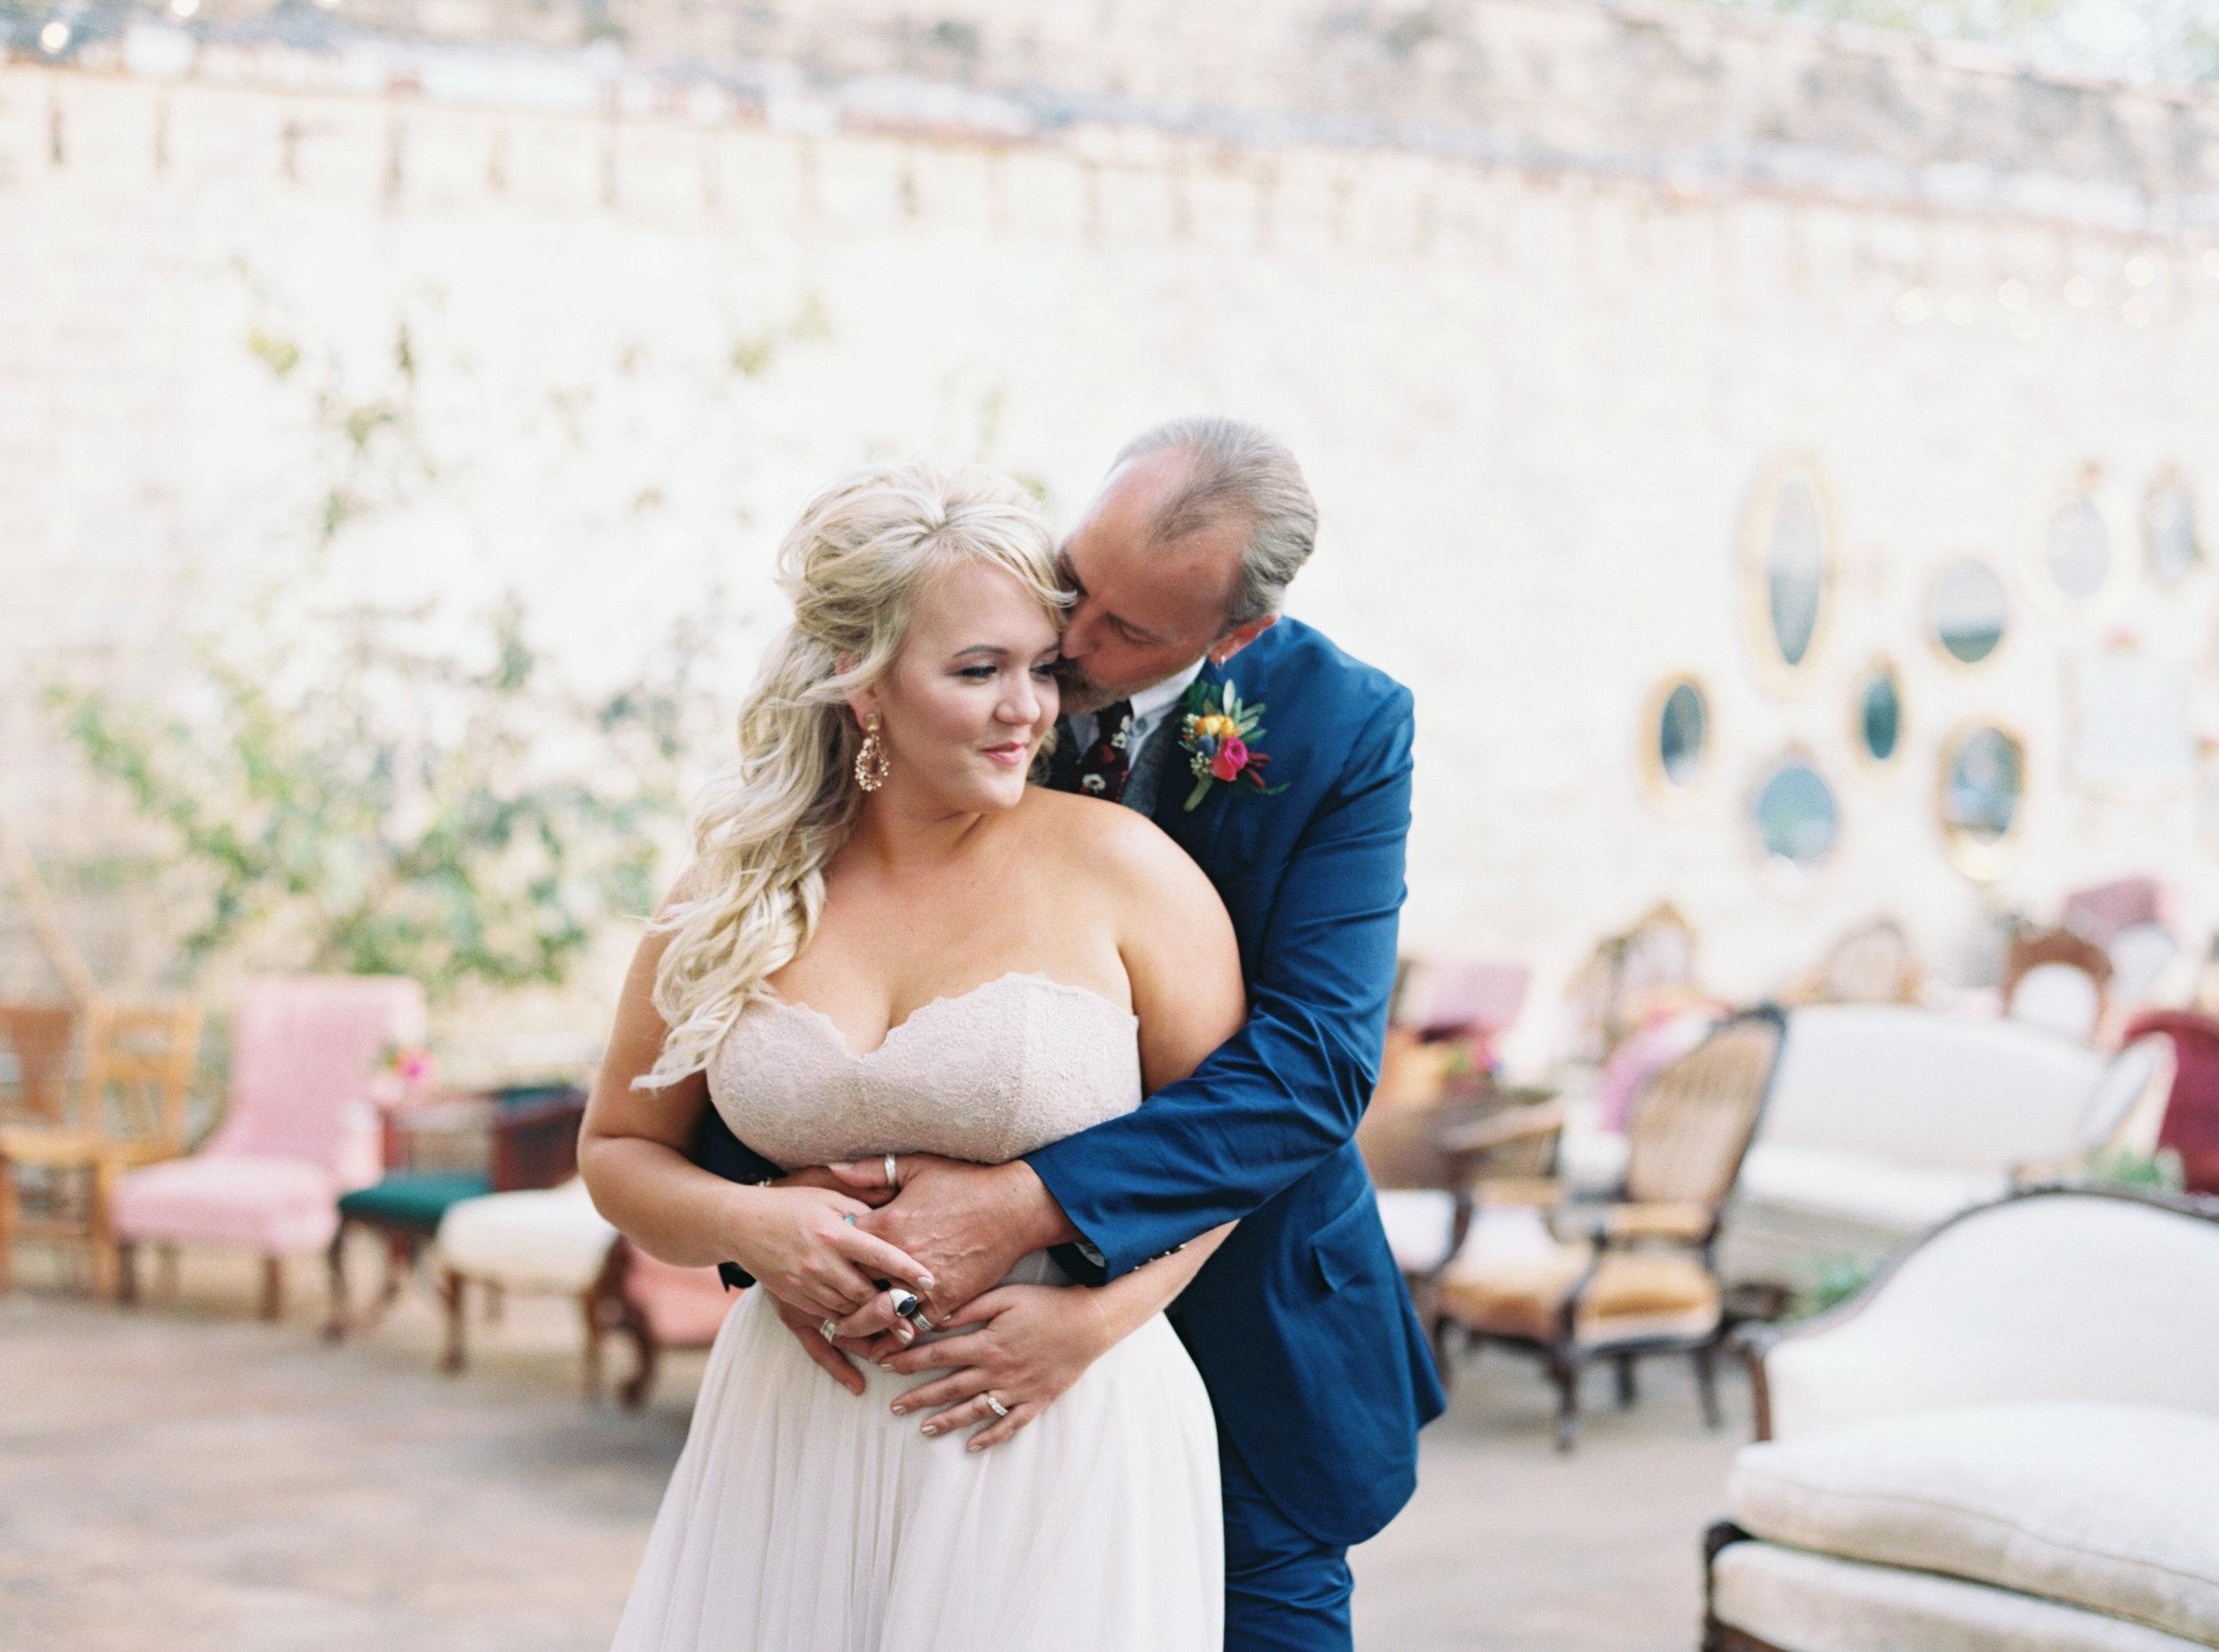 Mandi_Oliver_Chattanooga_Wedding_Abigail_Malone_Photography_Film-301.jpg